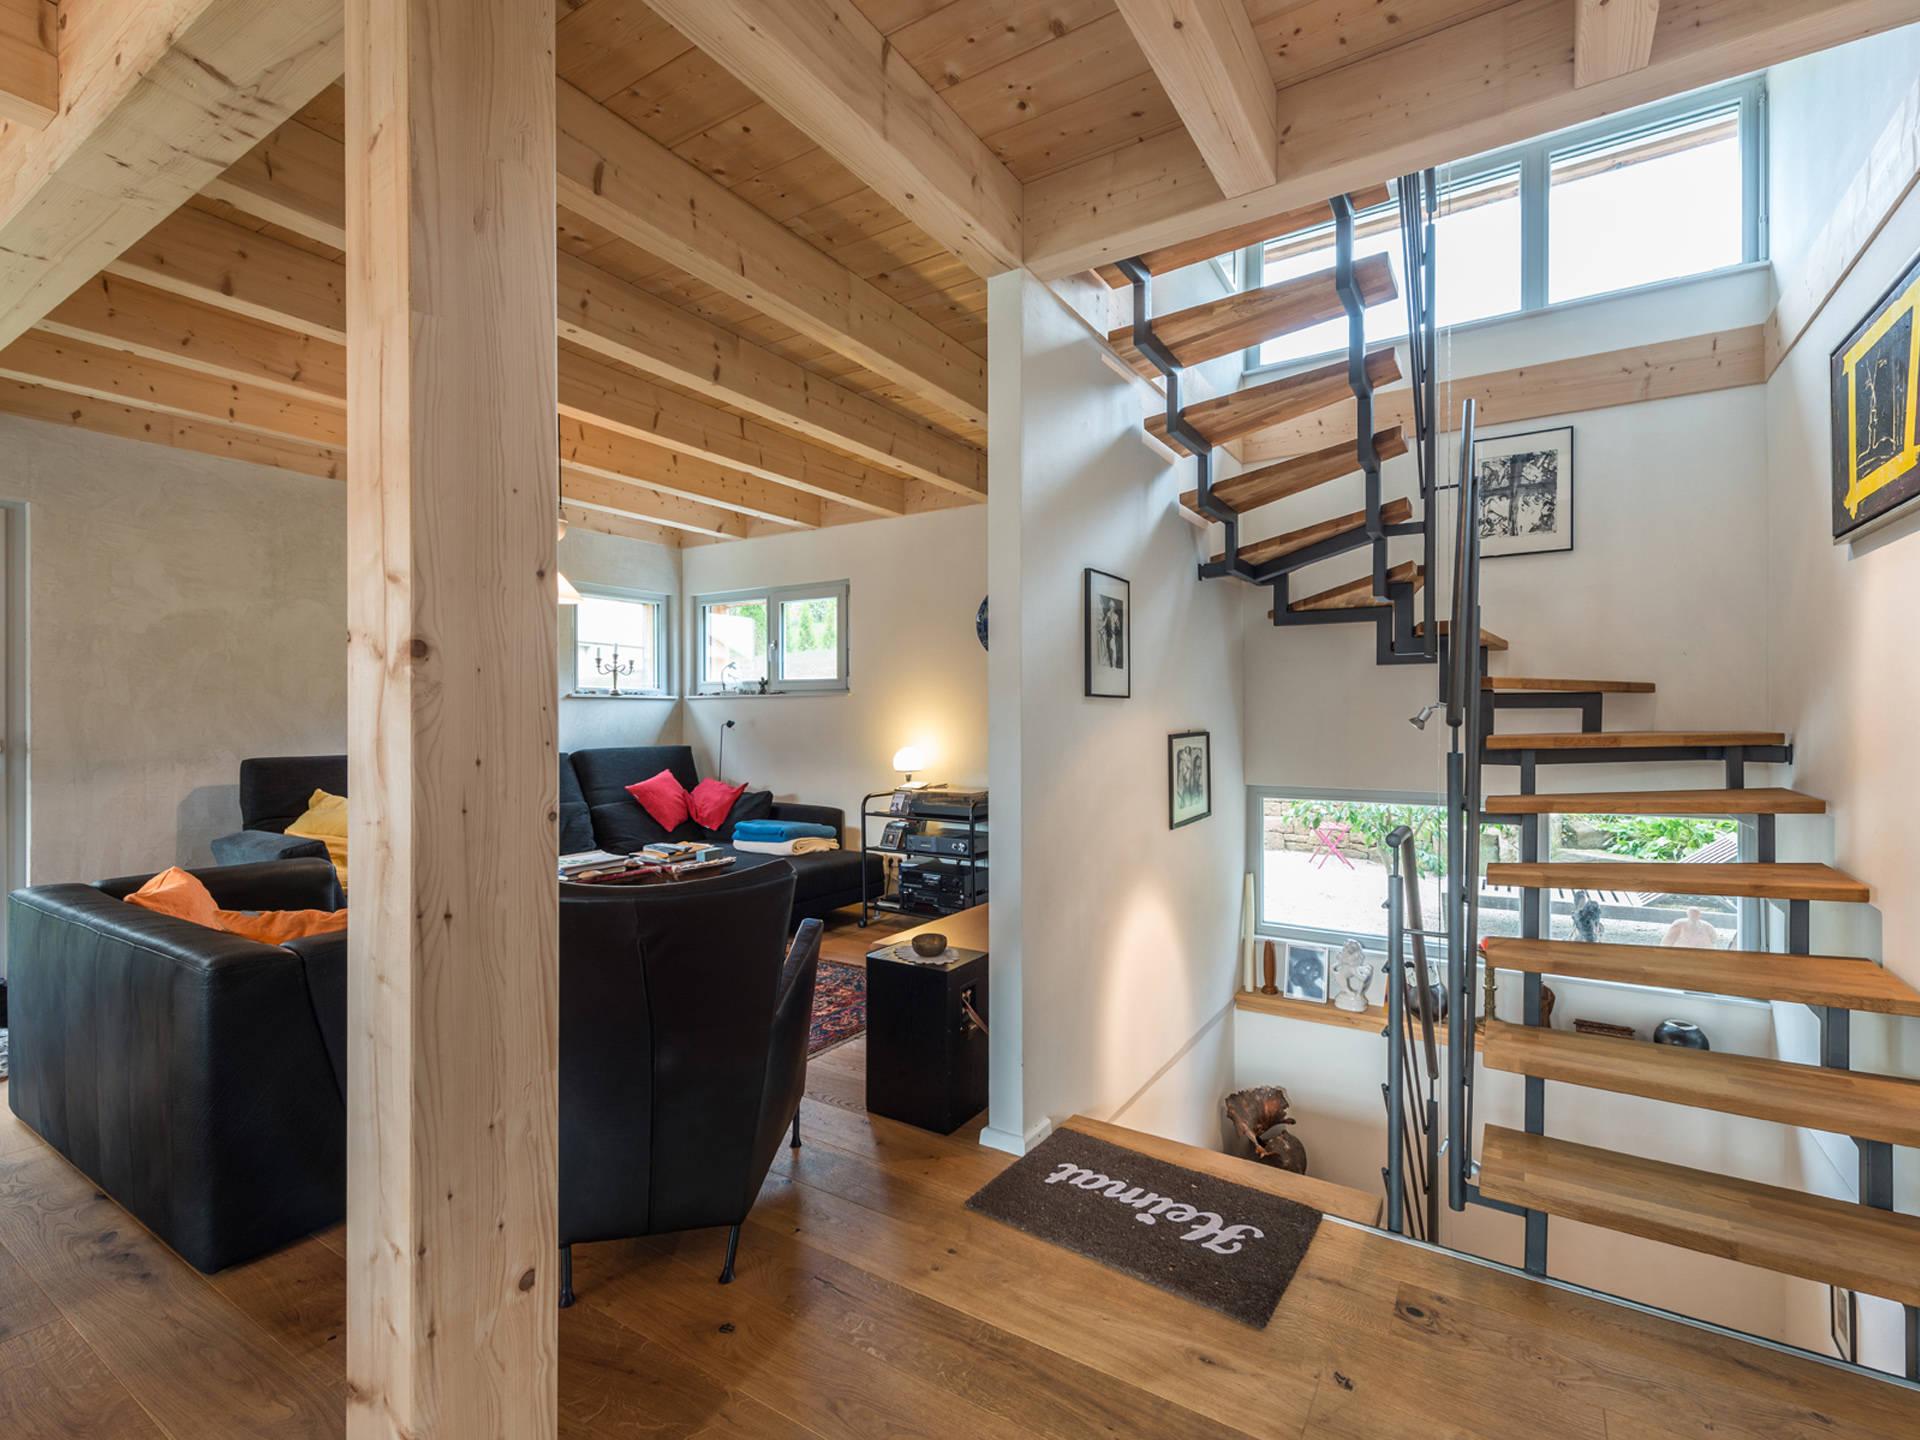 Haus Design 120 - Frammelsberger R. Ingenieur - Holzhaus